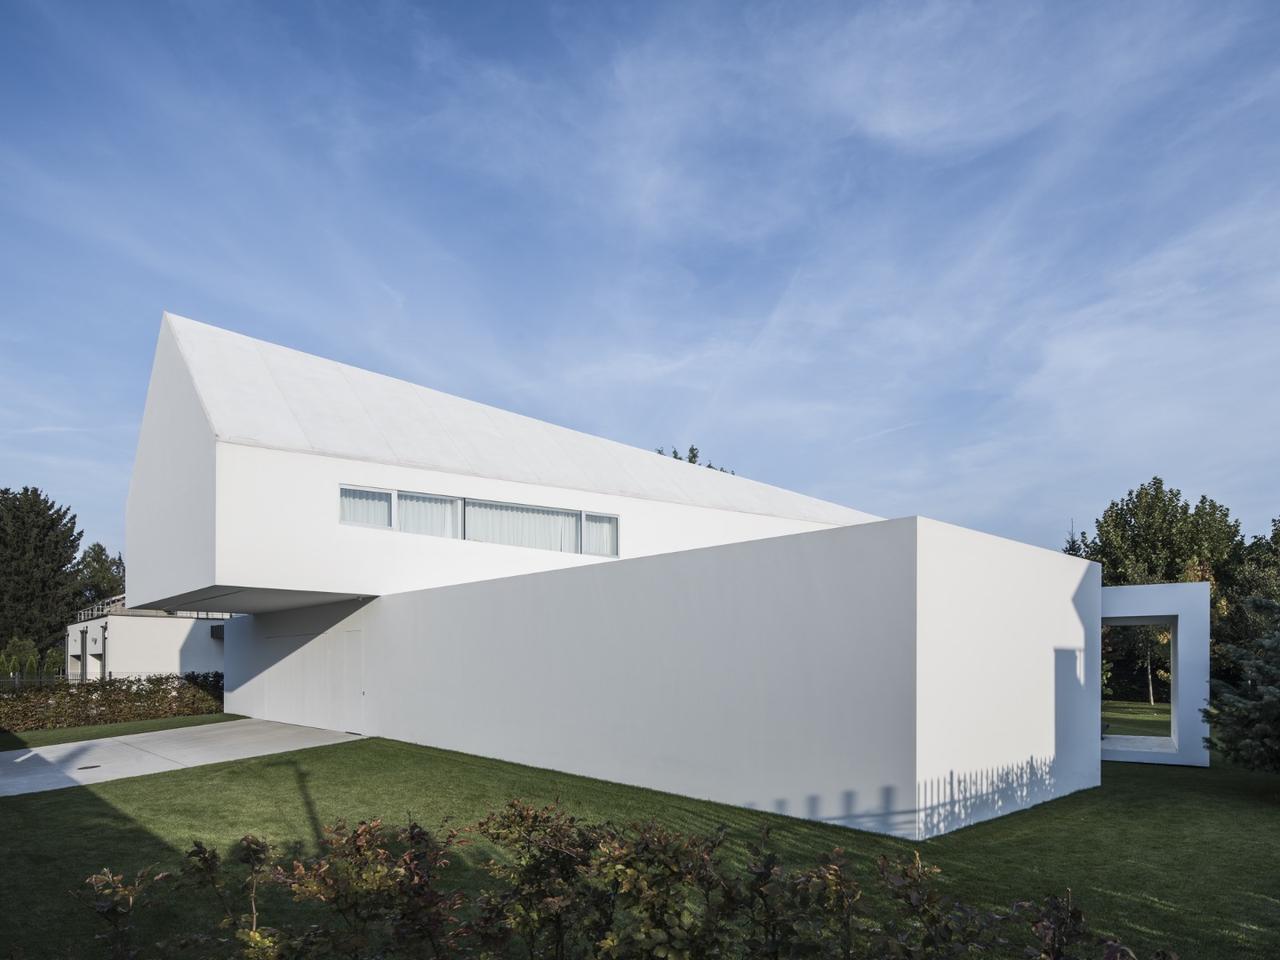 Quadrant House features a moving terrace